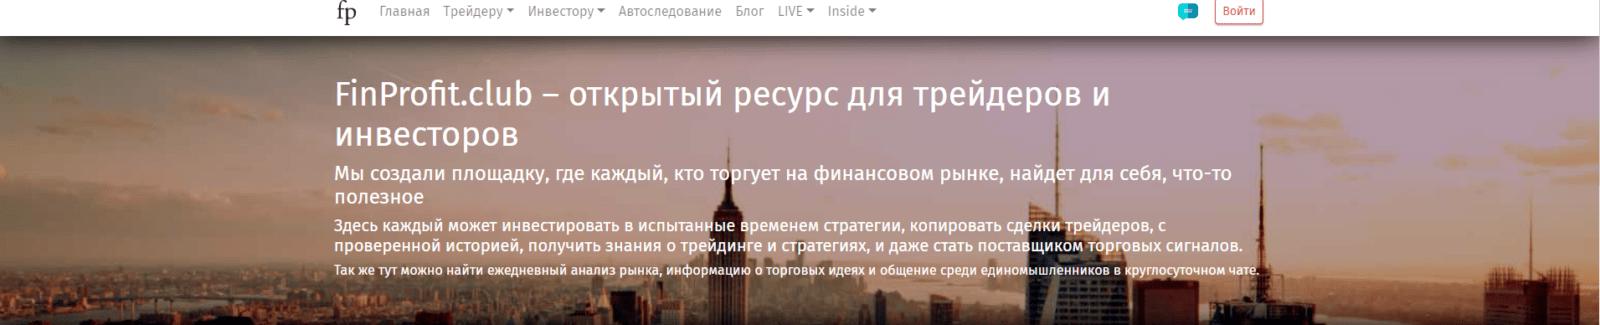 Finprofit.clubсайт